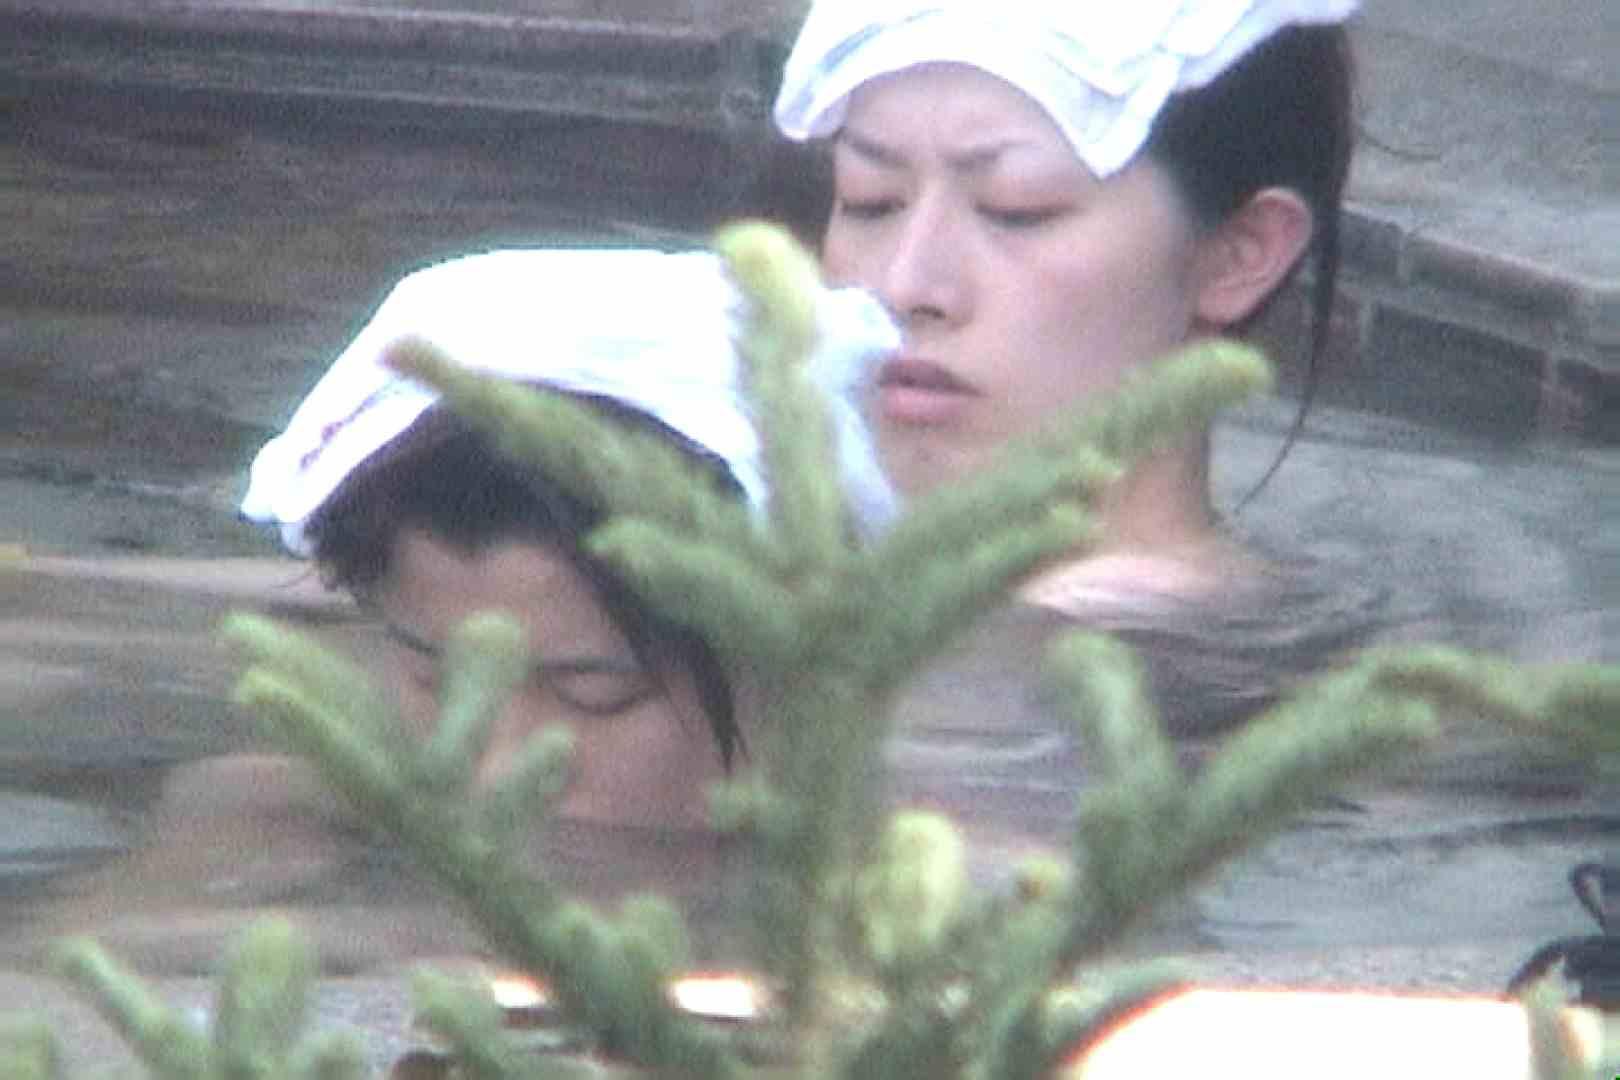 Aquaな露天風呂Vol.80【VIP限定】 露天風呂編  76PIX 58